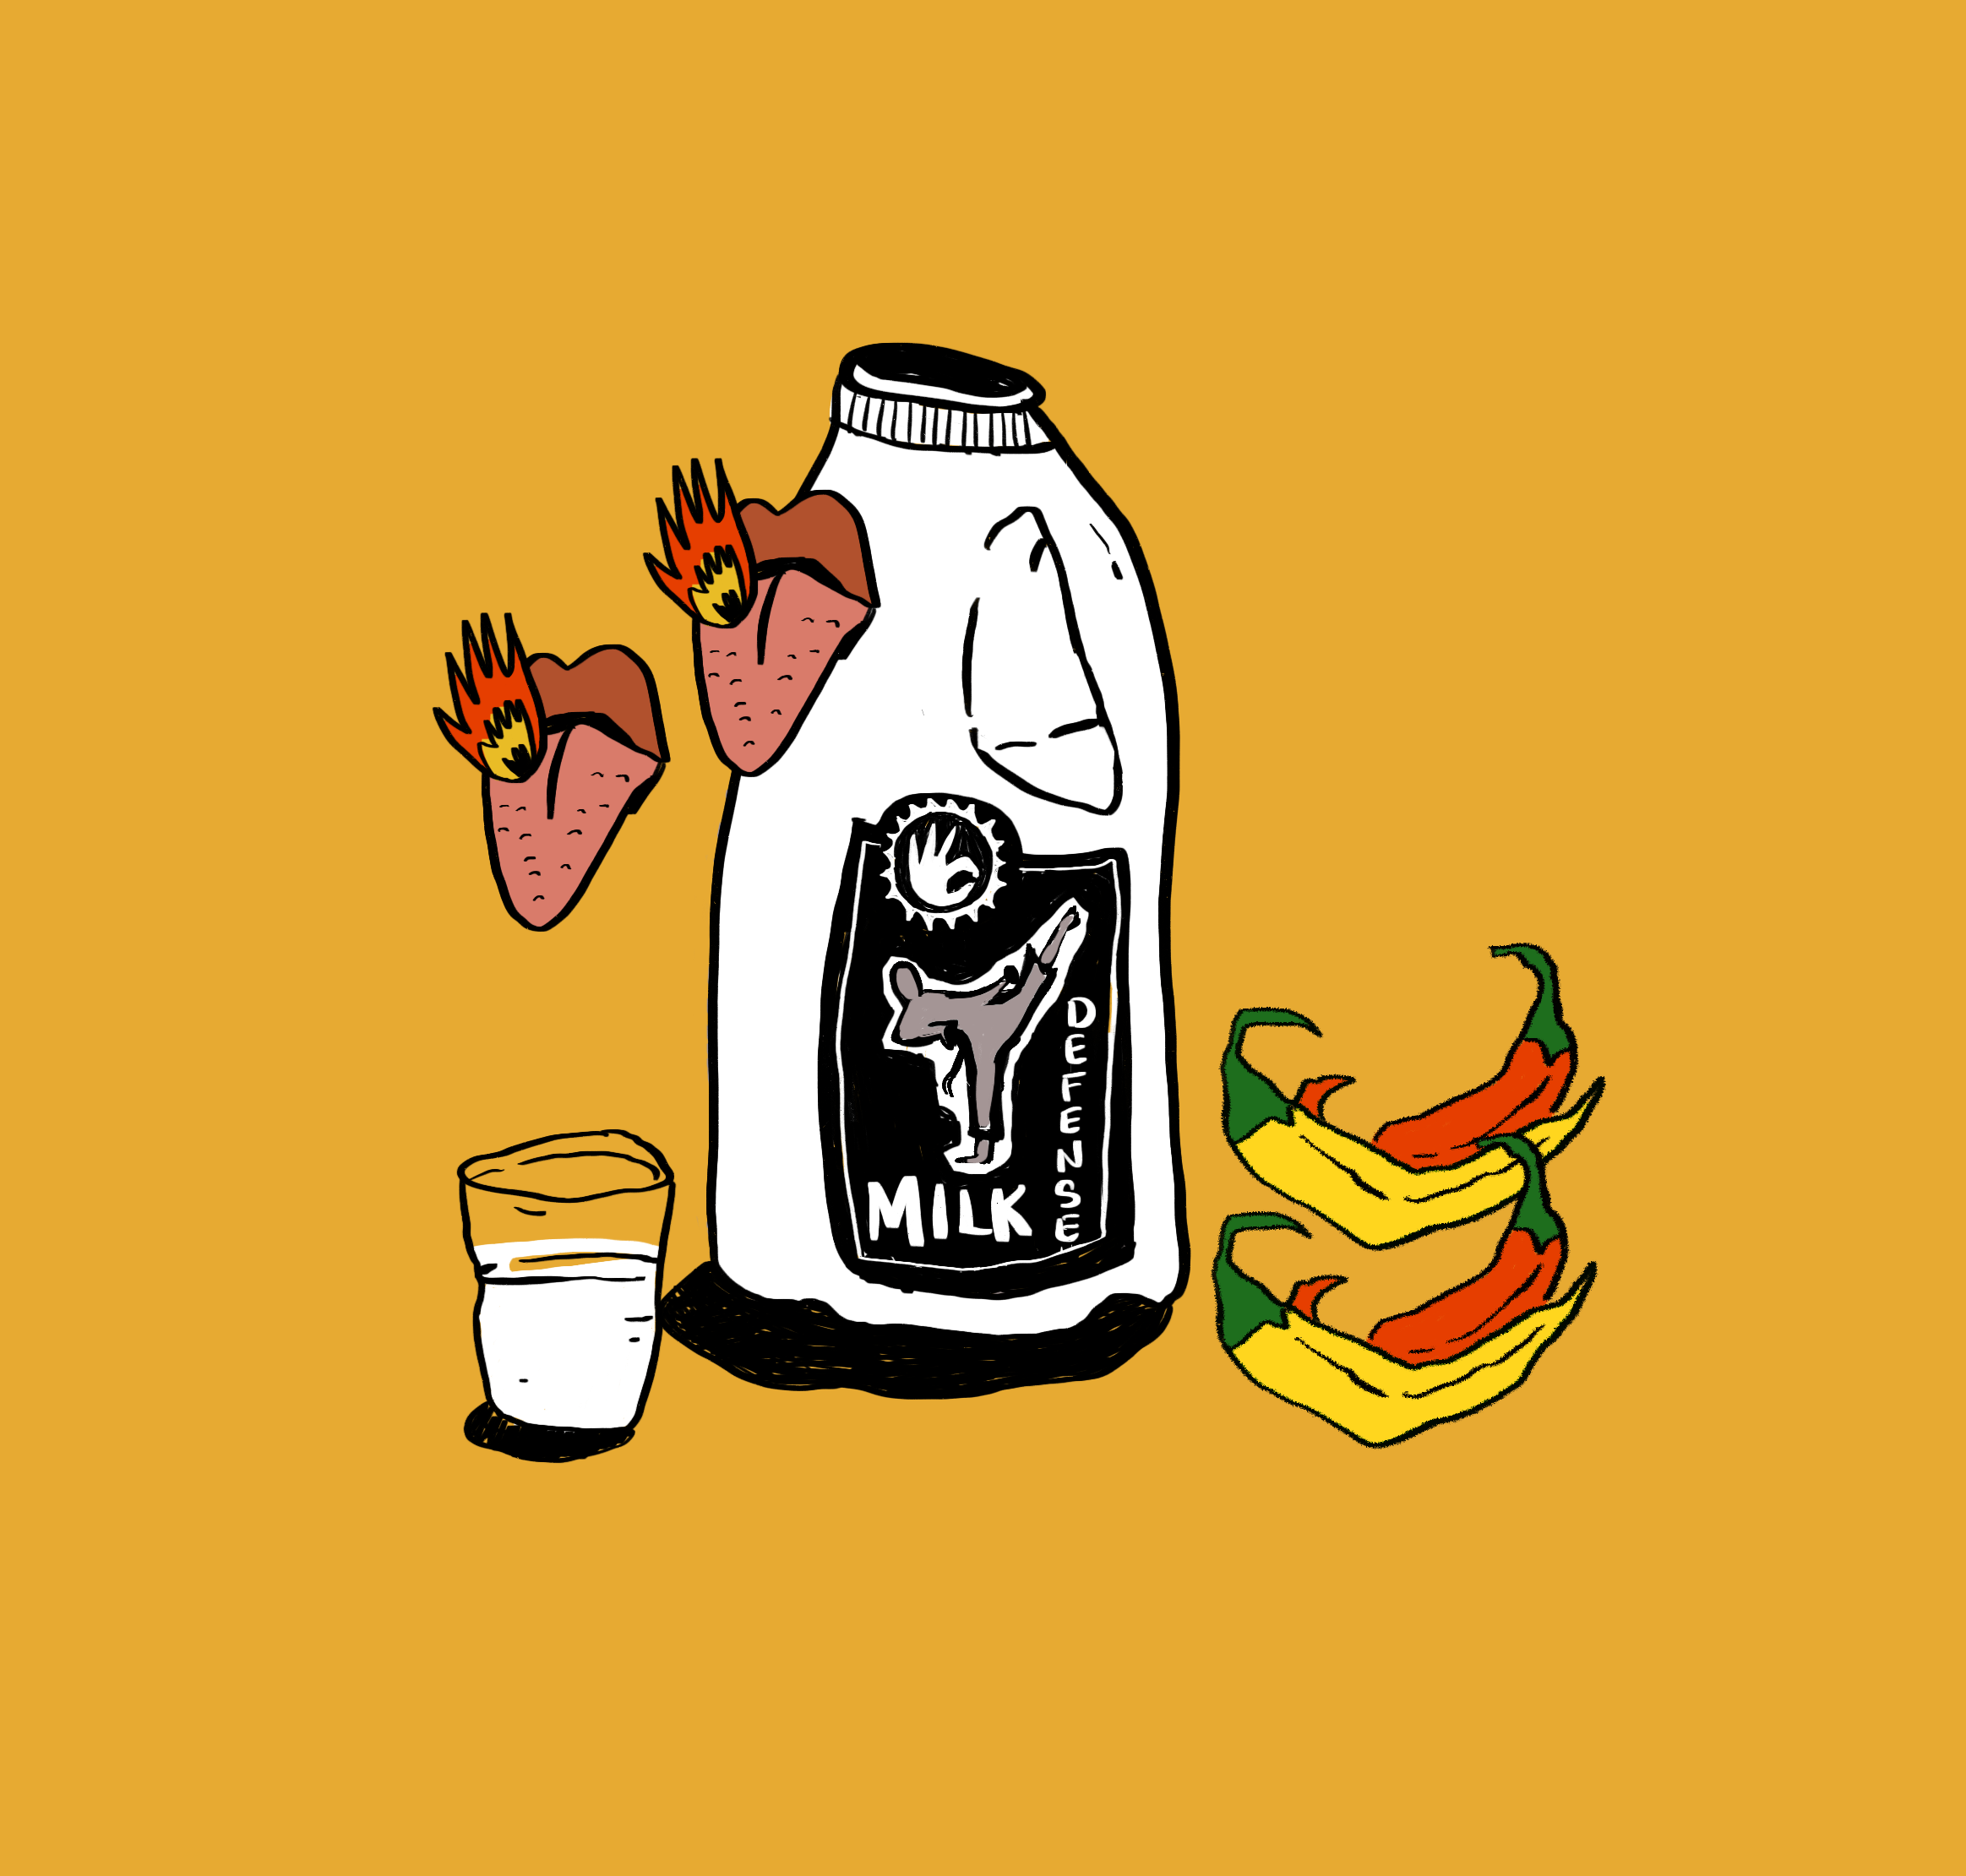 Defense Milk